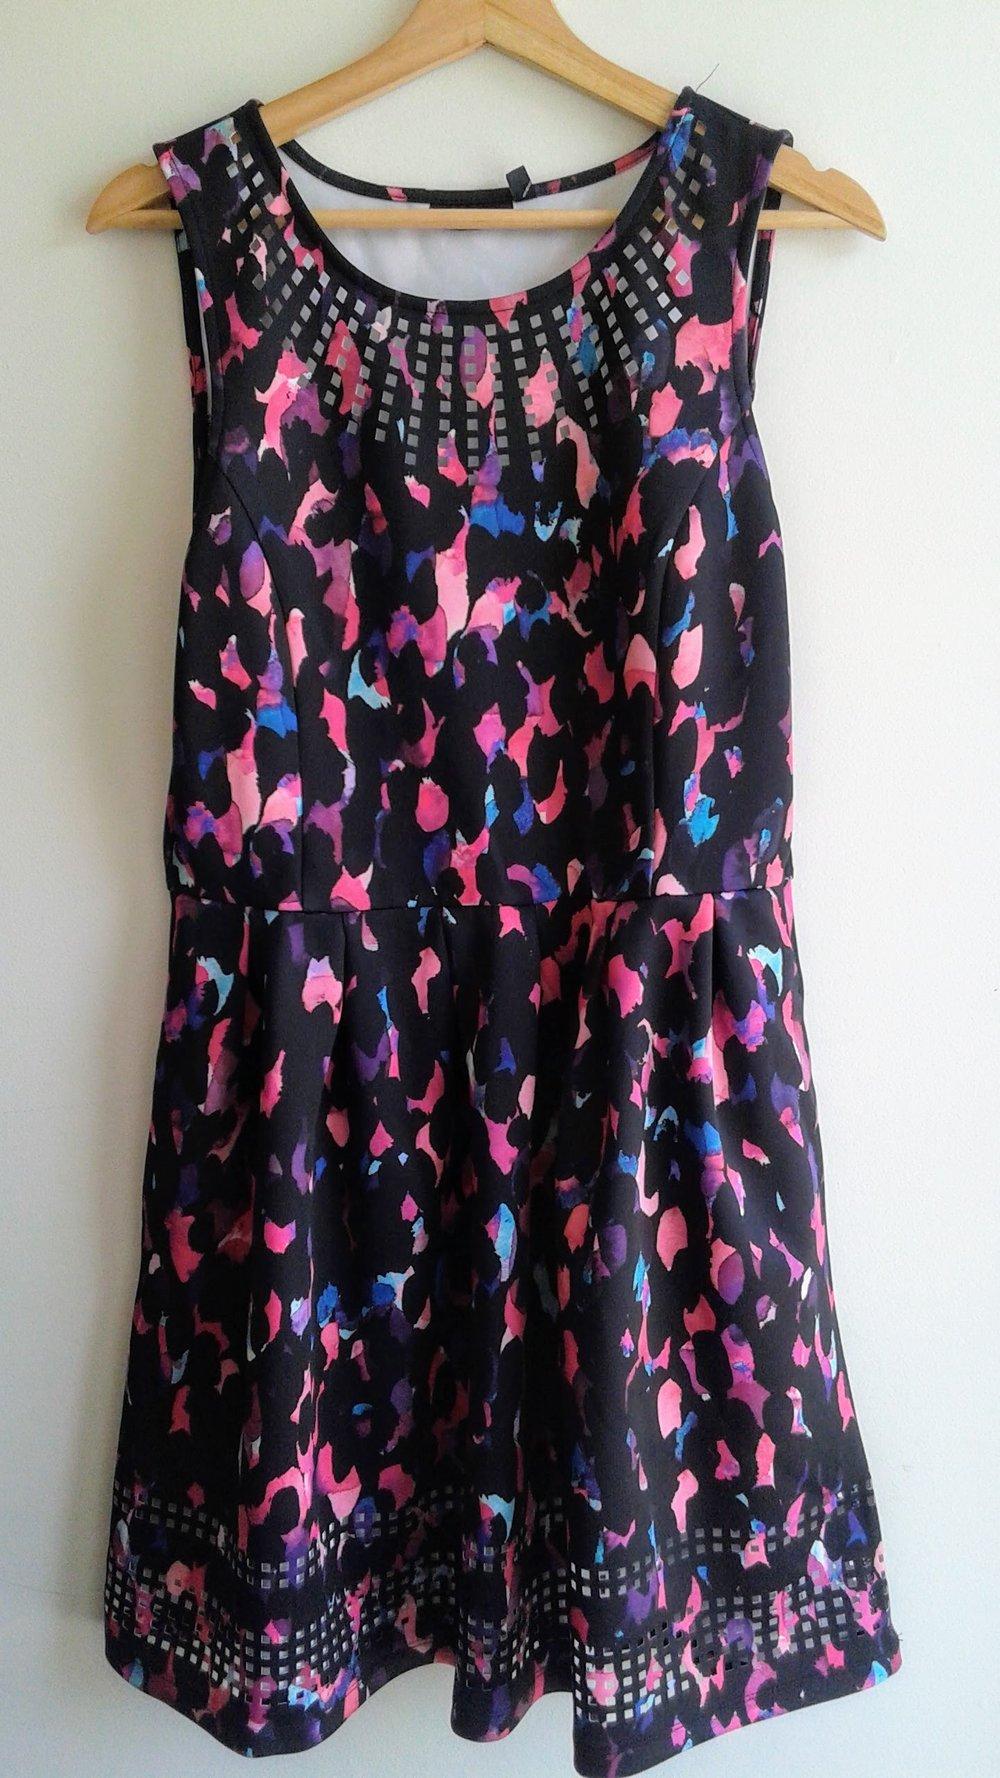 Apt 9 dress; Size L, $34